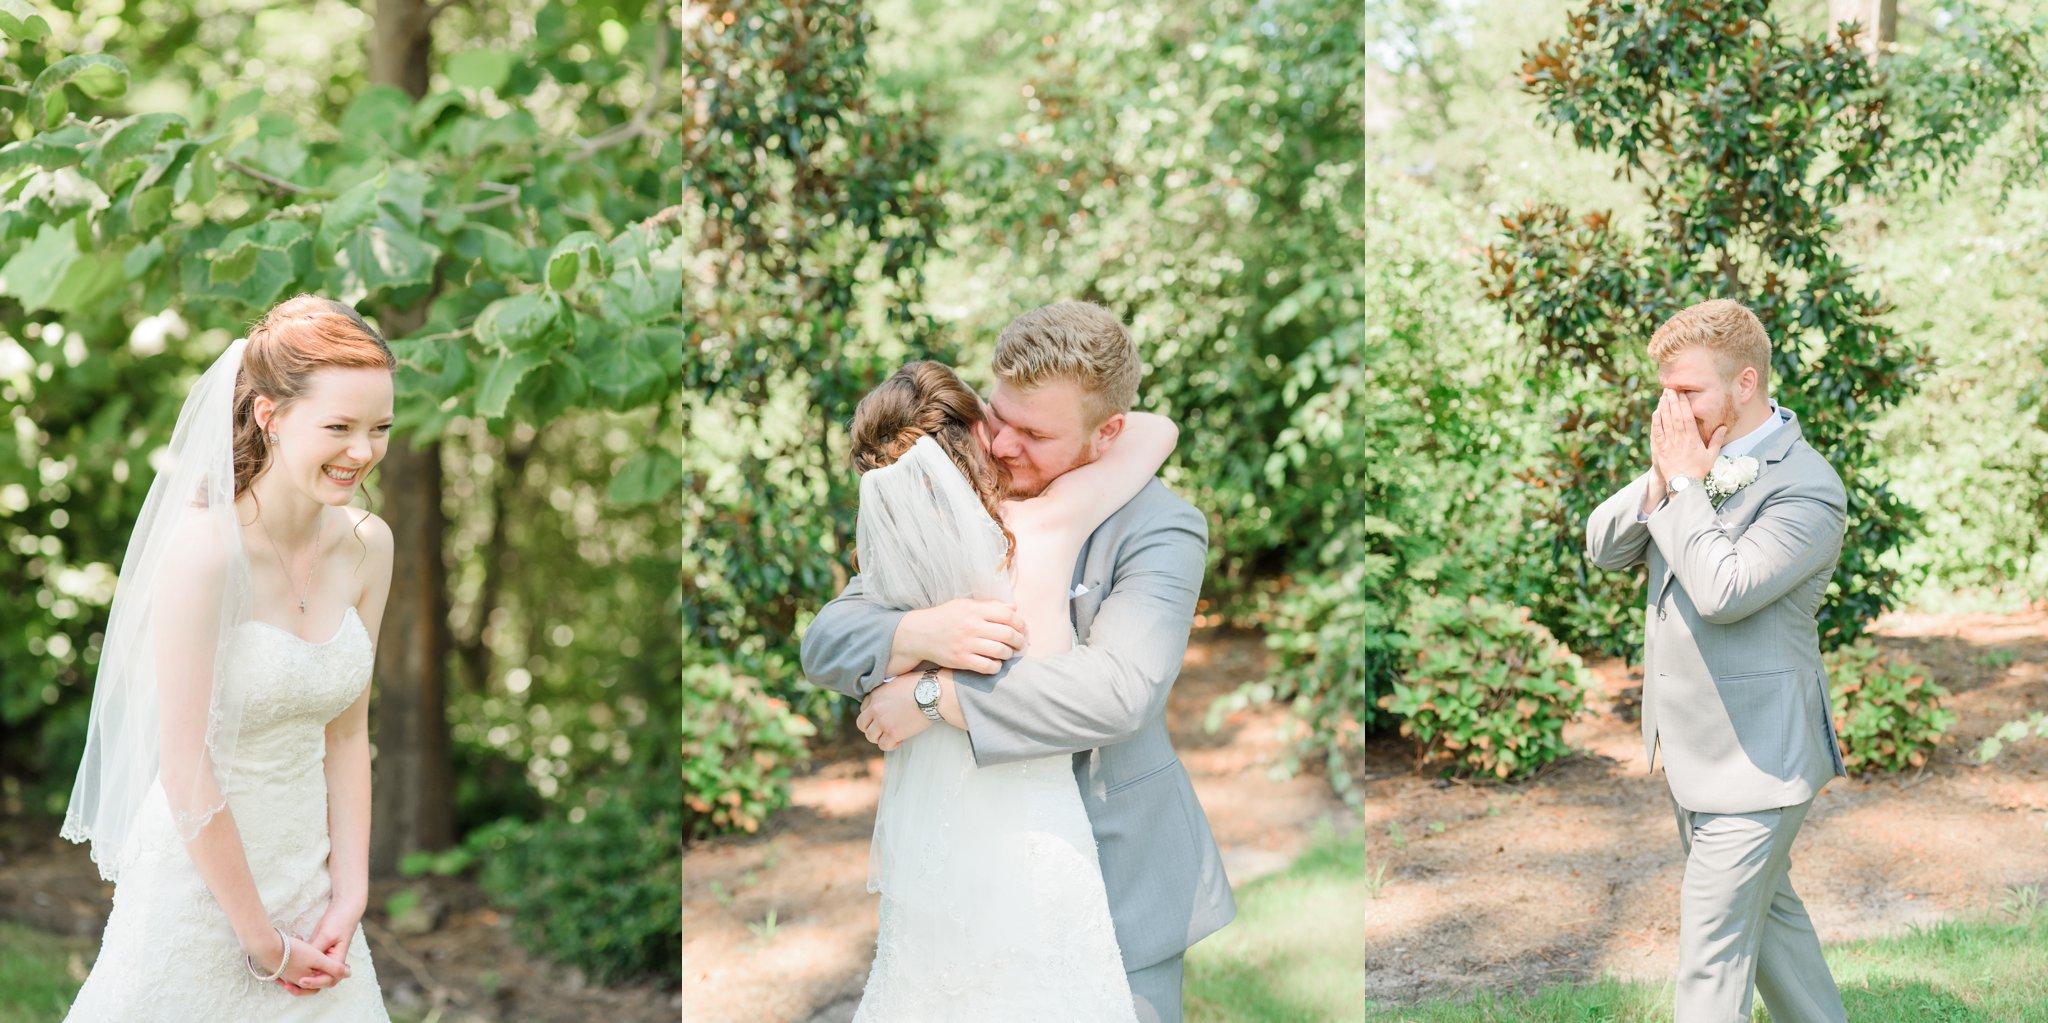 Katelyn and Evan Wedding Blog_0890.jpg